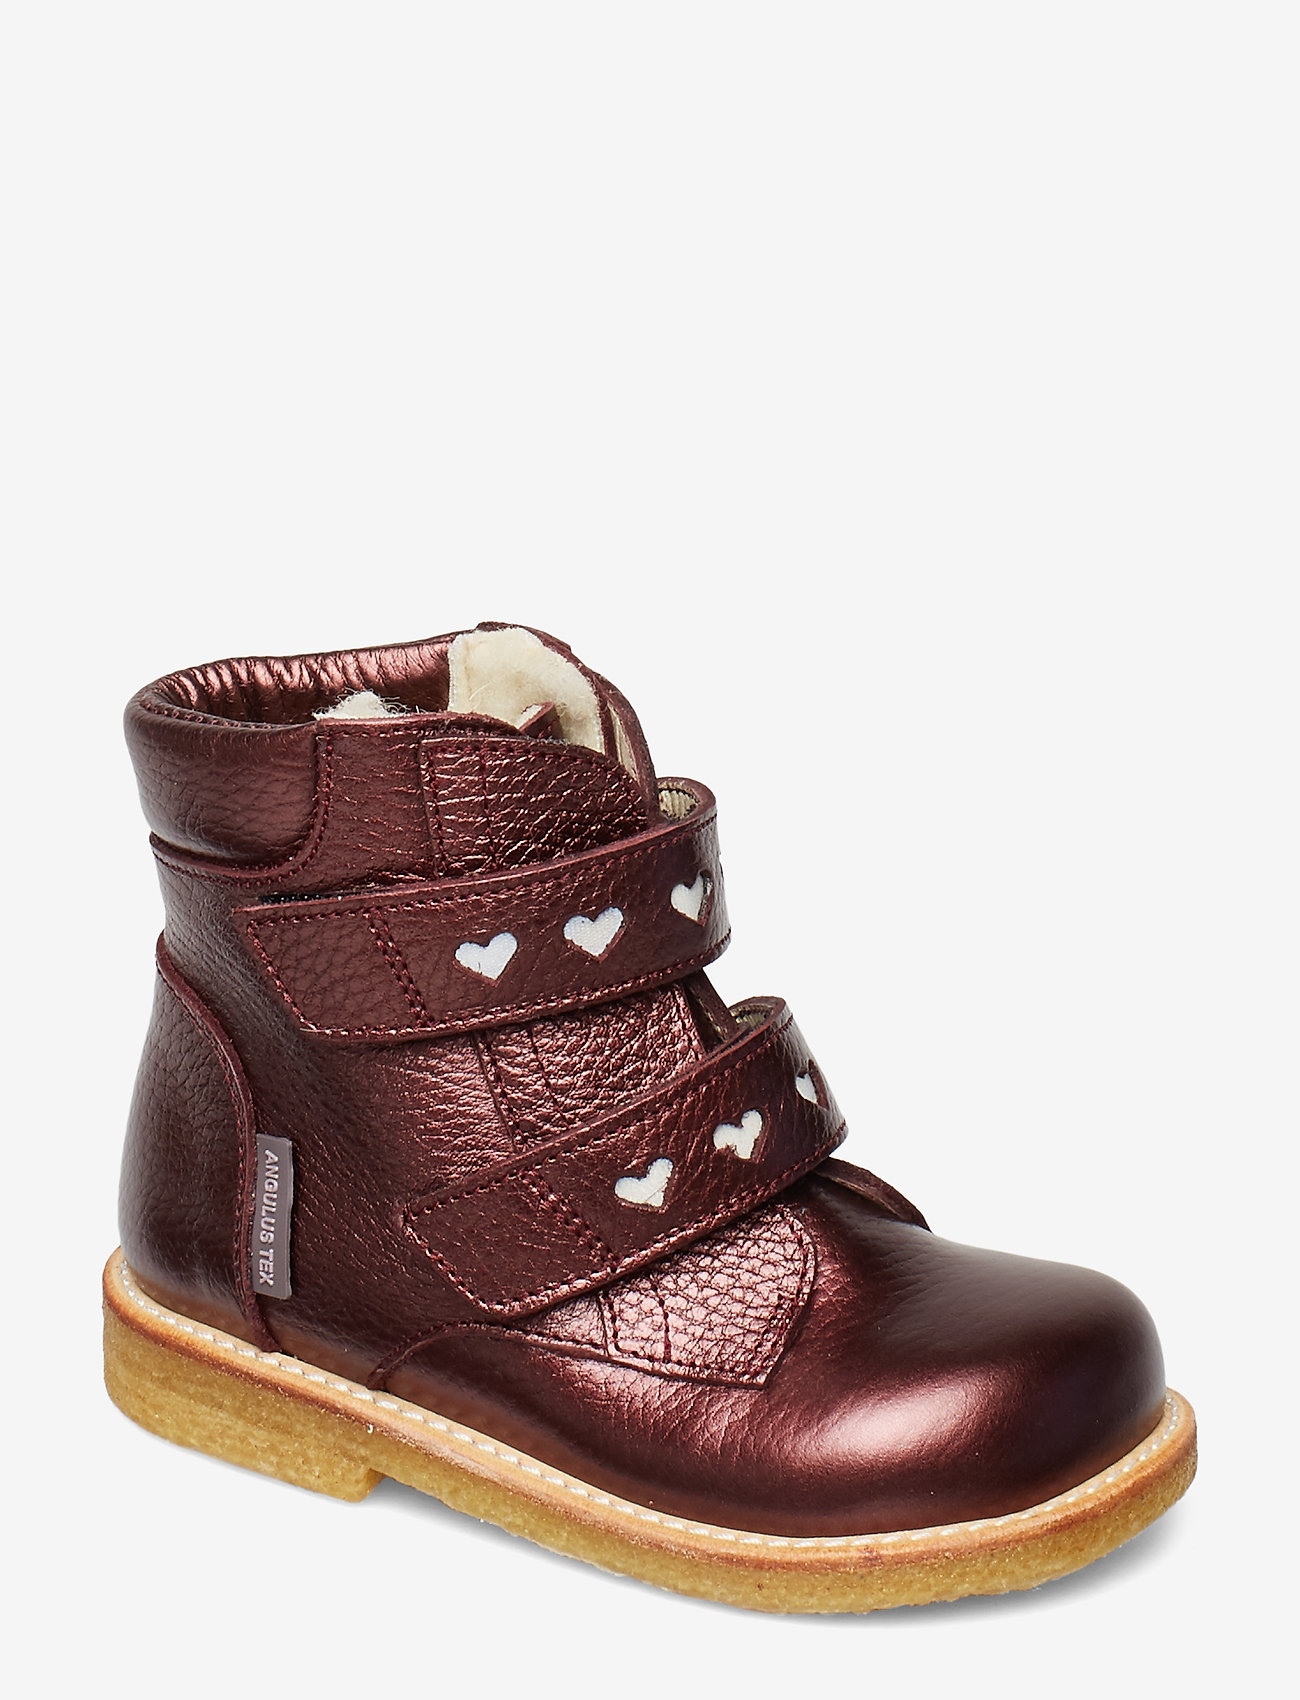 ANGULUS - Boots - flat - with velcro - lära-gå-skor - 1536/2012 bordeaux shine - 0